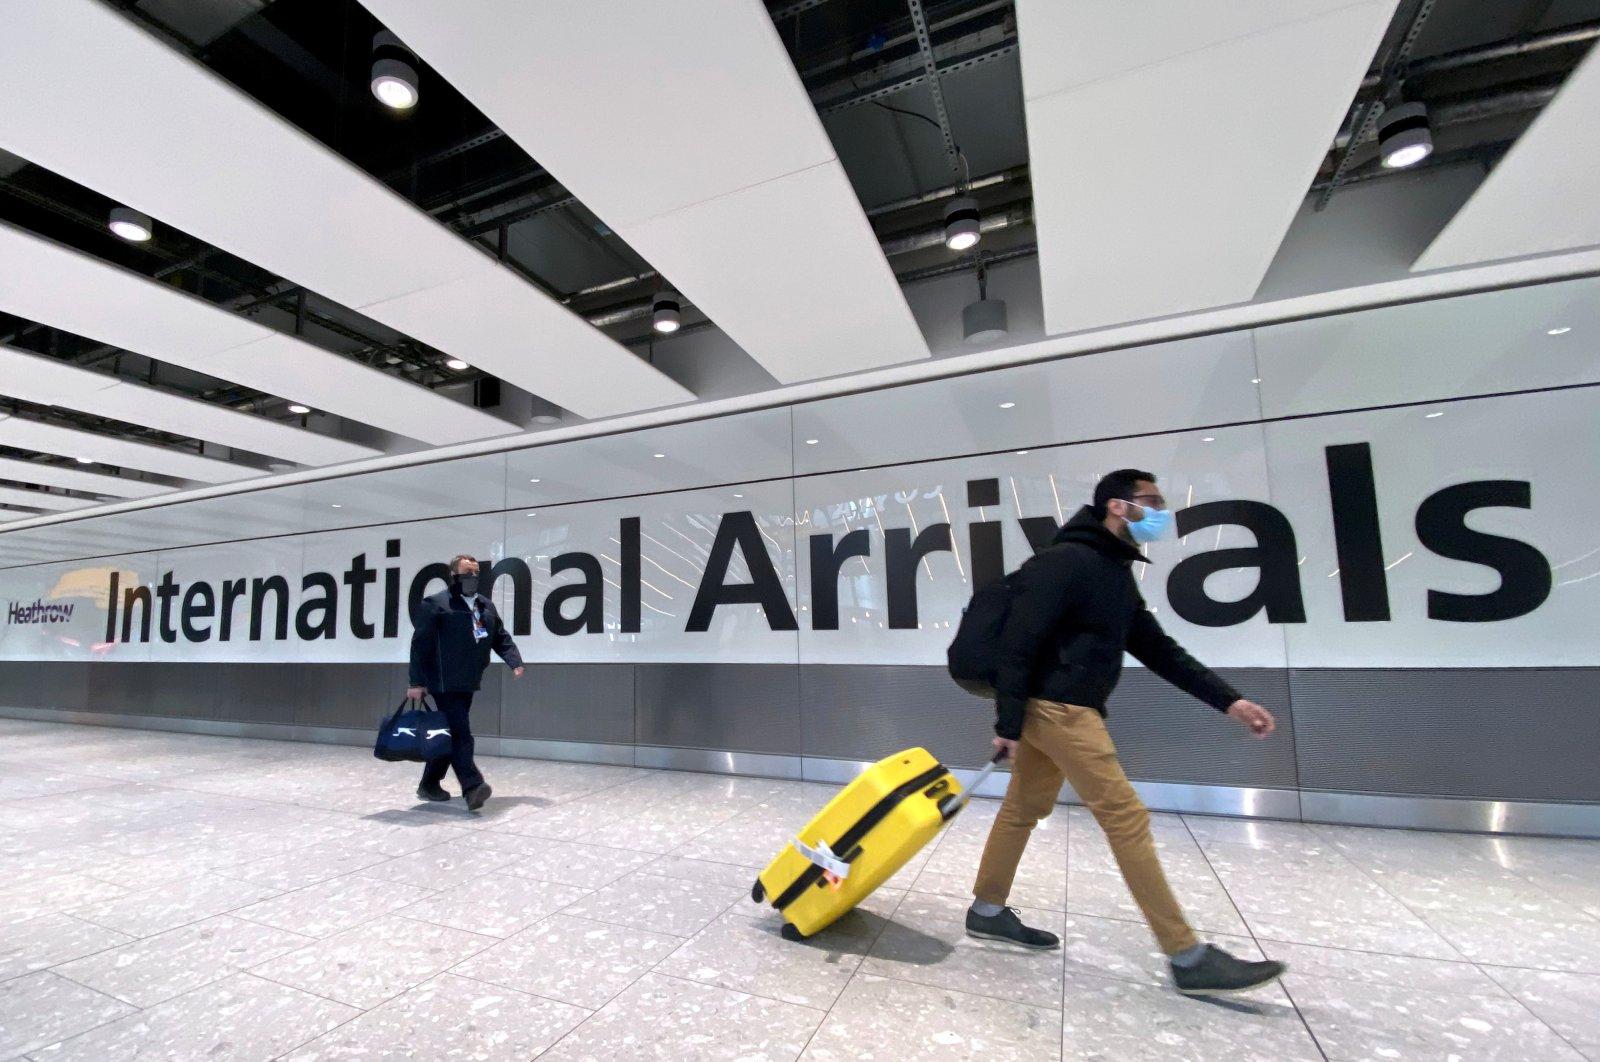 Travelers at Heathrow Airport, London, Britain, Feb. 13, 2021. (Reuters Photo)